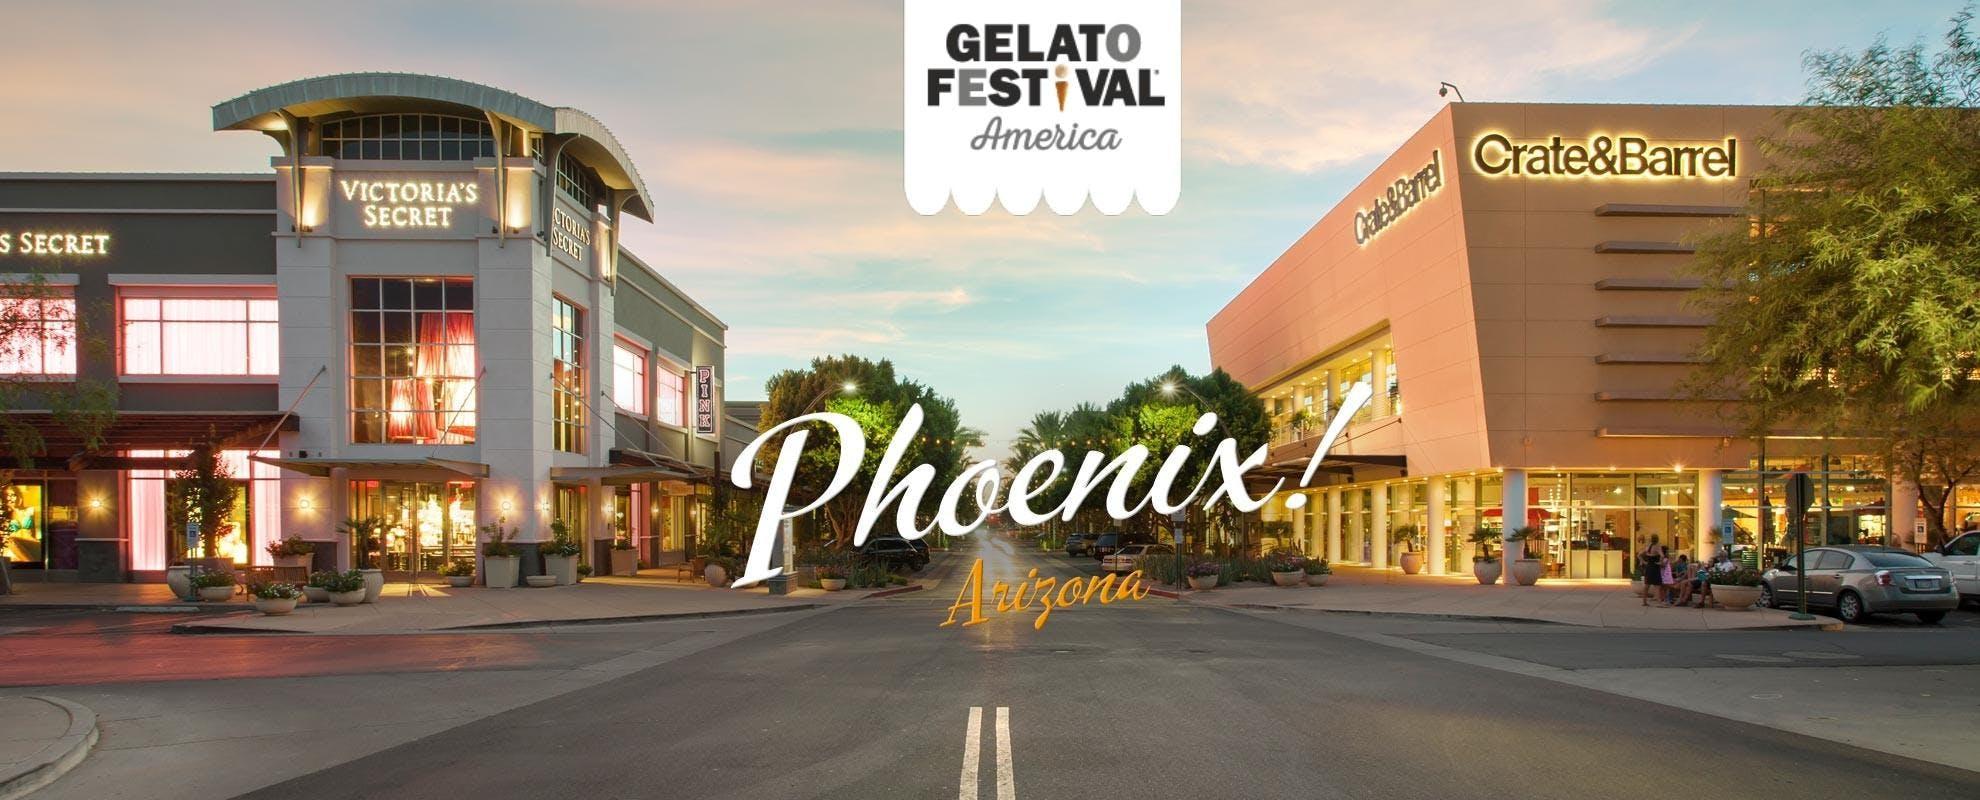 GELATO FESTIVAL PHOENIX 2018